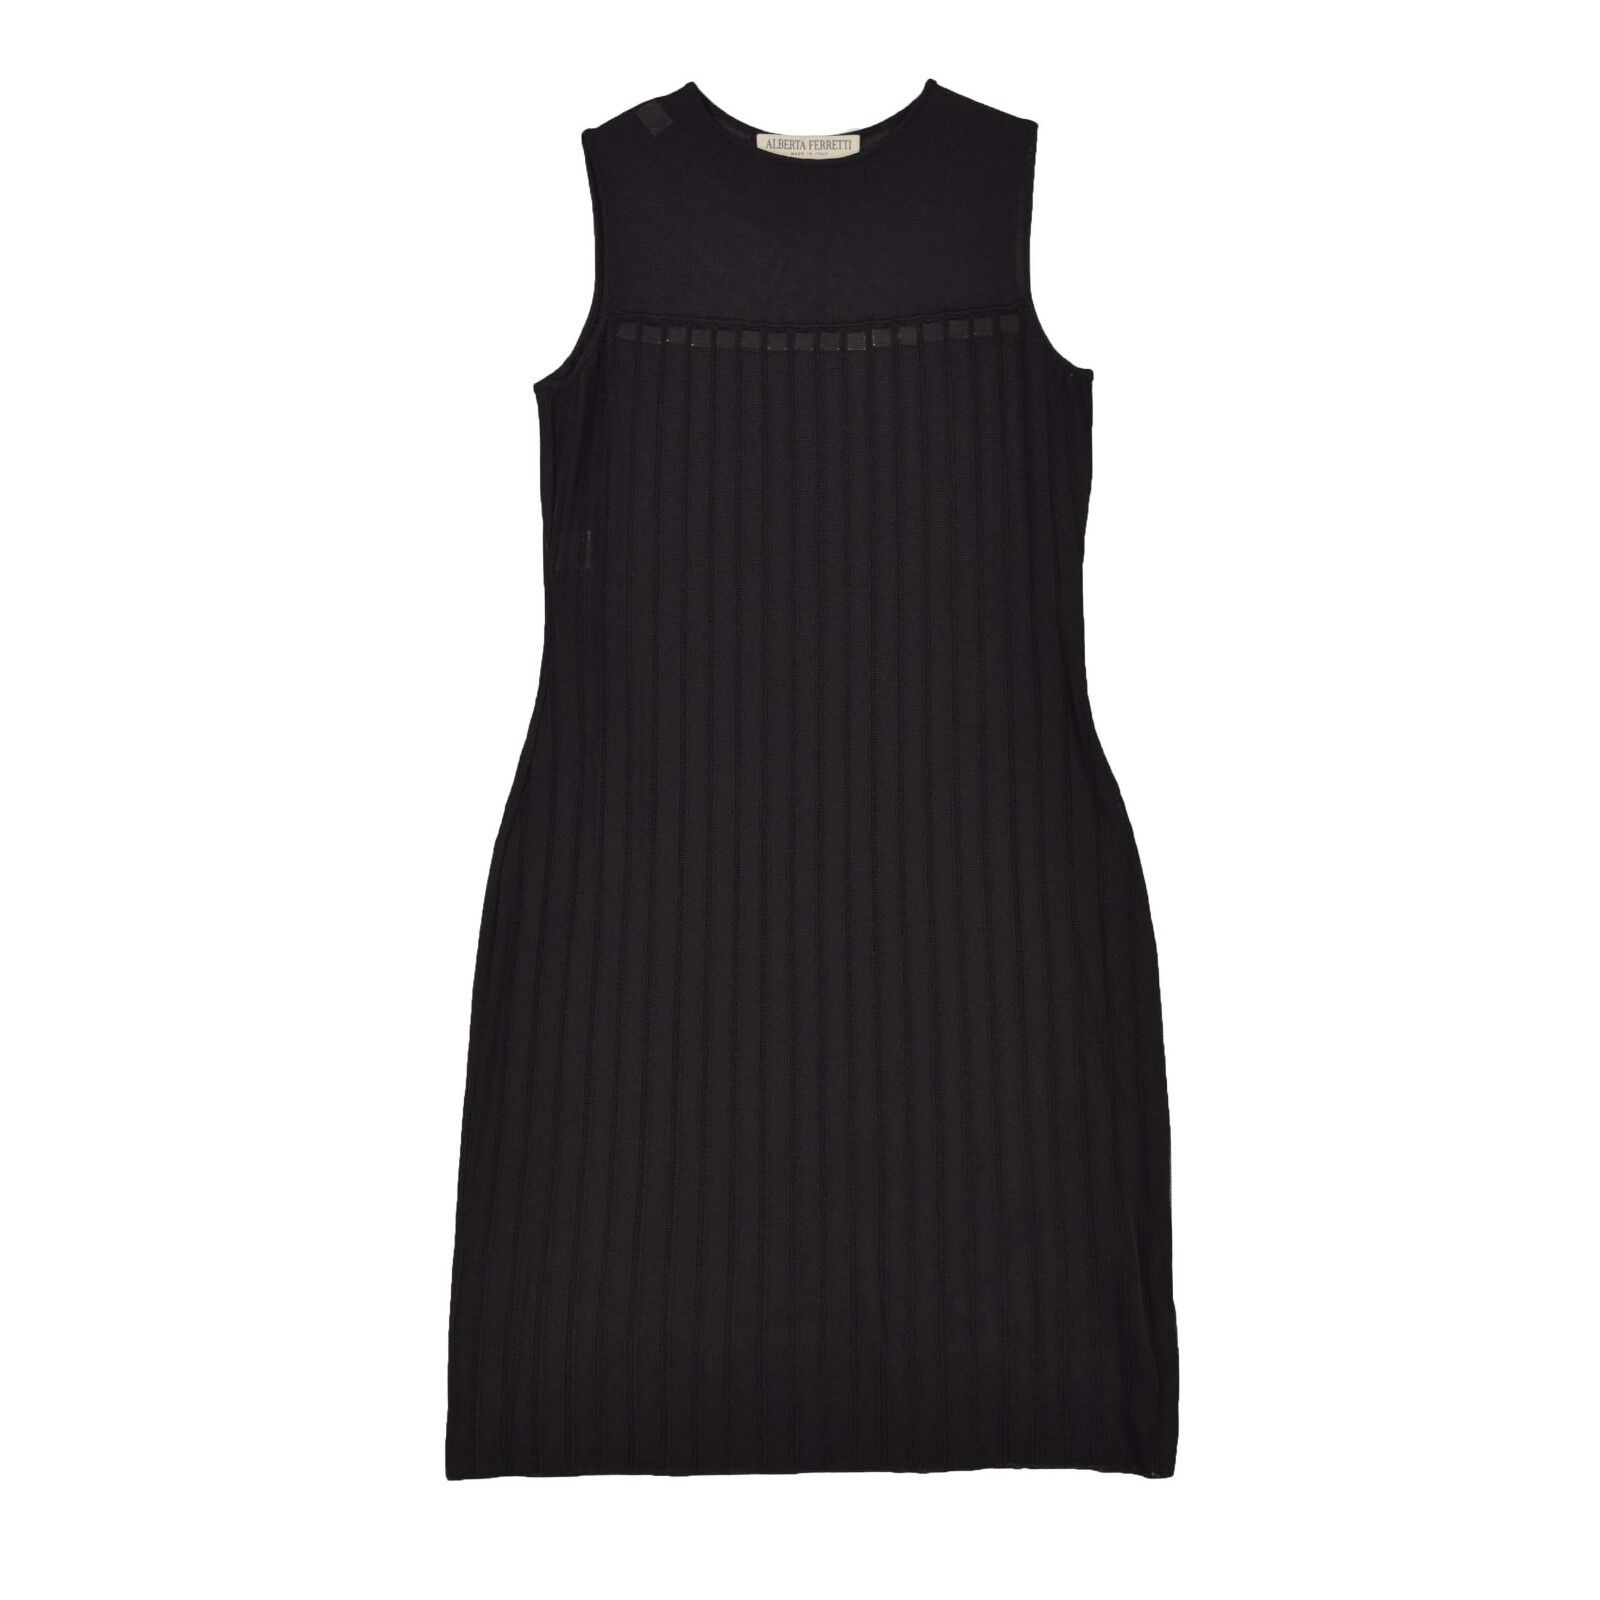 ALBERTA FERRETTI Damen Kleid M 38 38 38 Sommerkleid Viskose grün Rock Dress Skirt wNEU a8e870